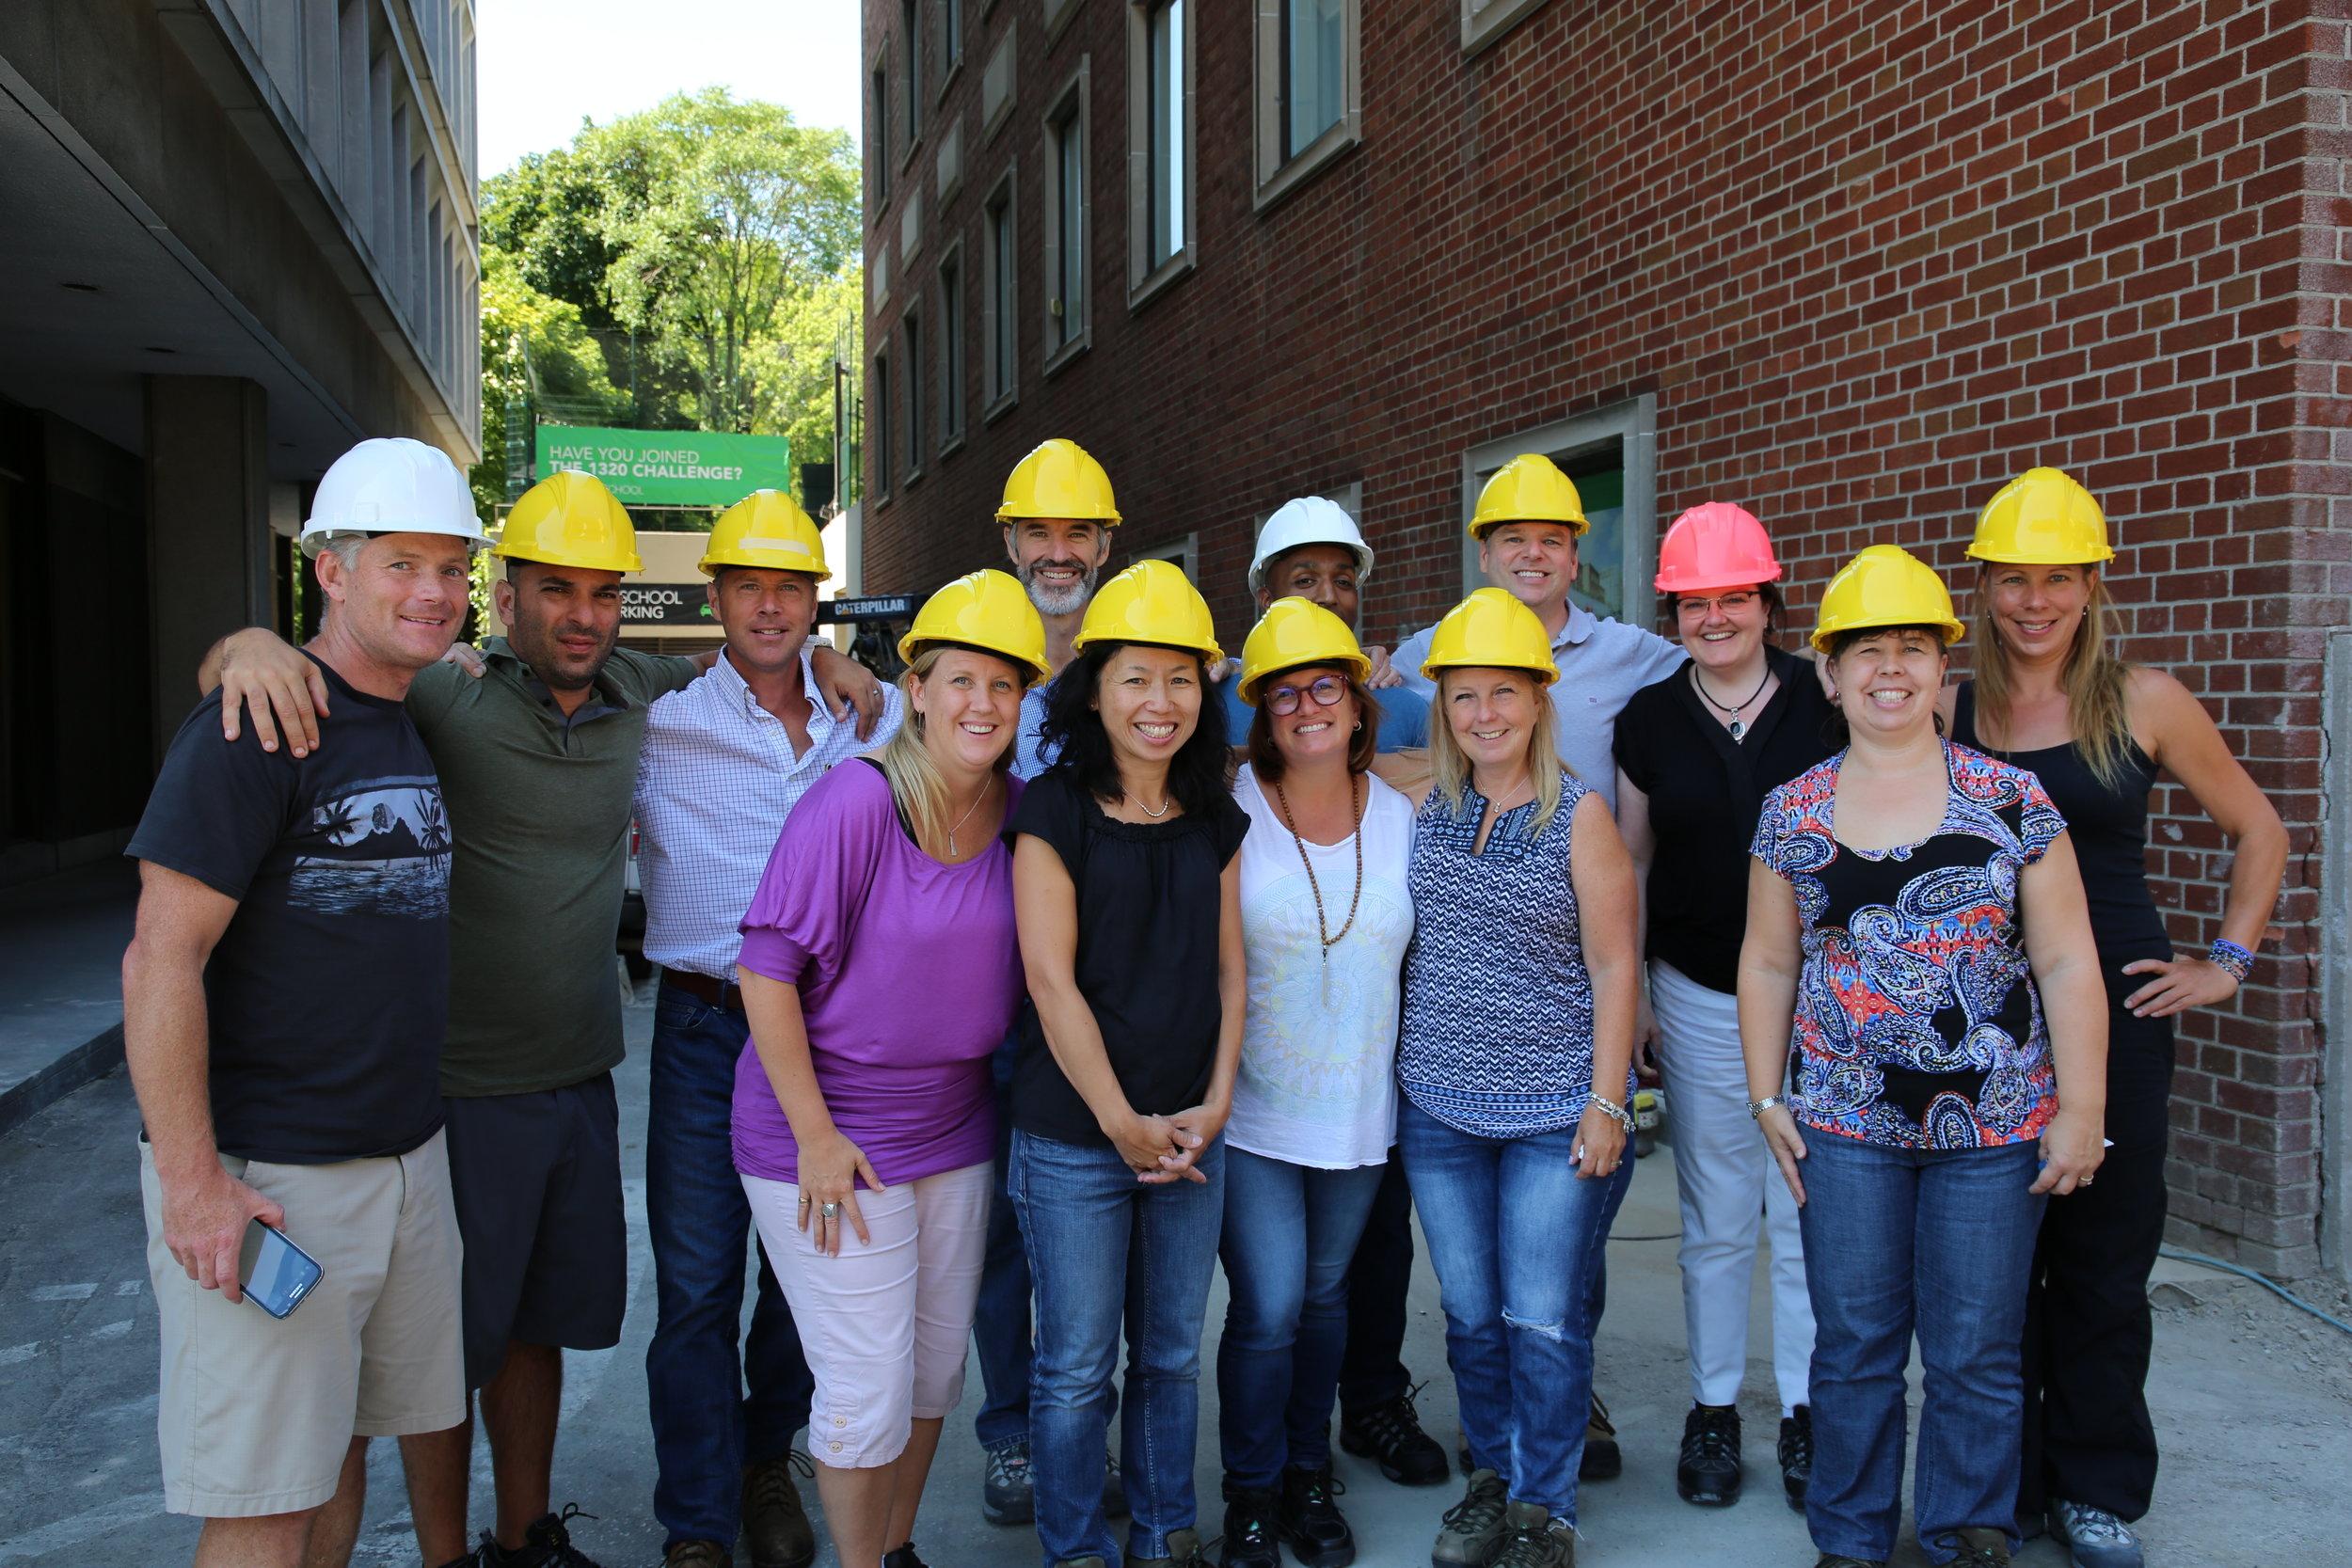 The York School Executive Team for 2016-2017